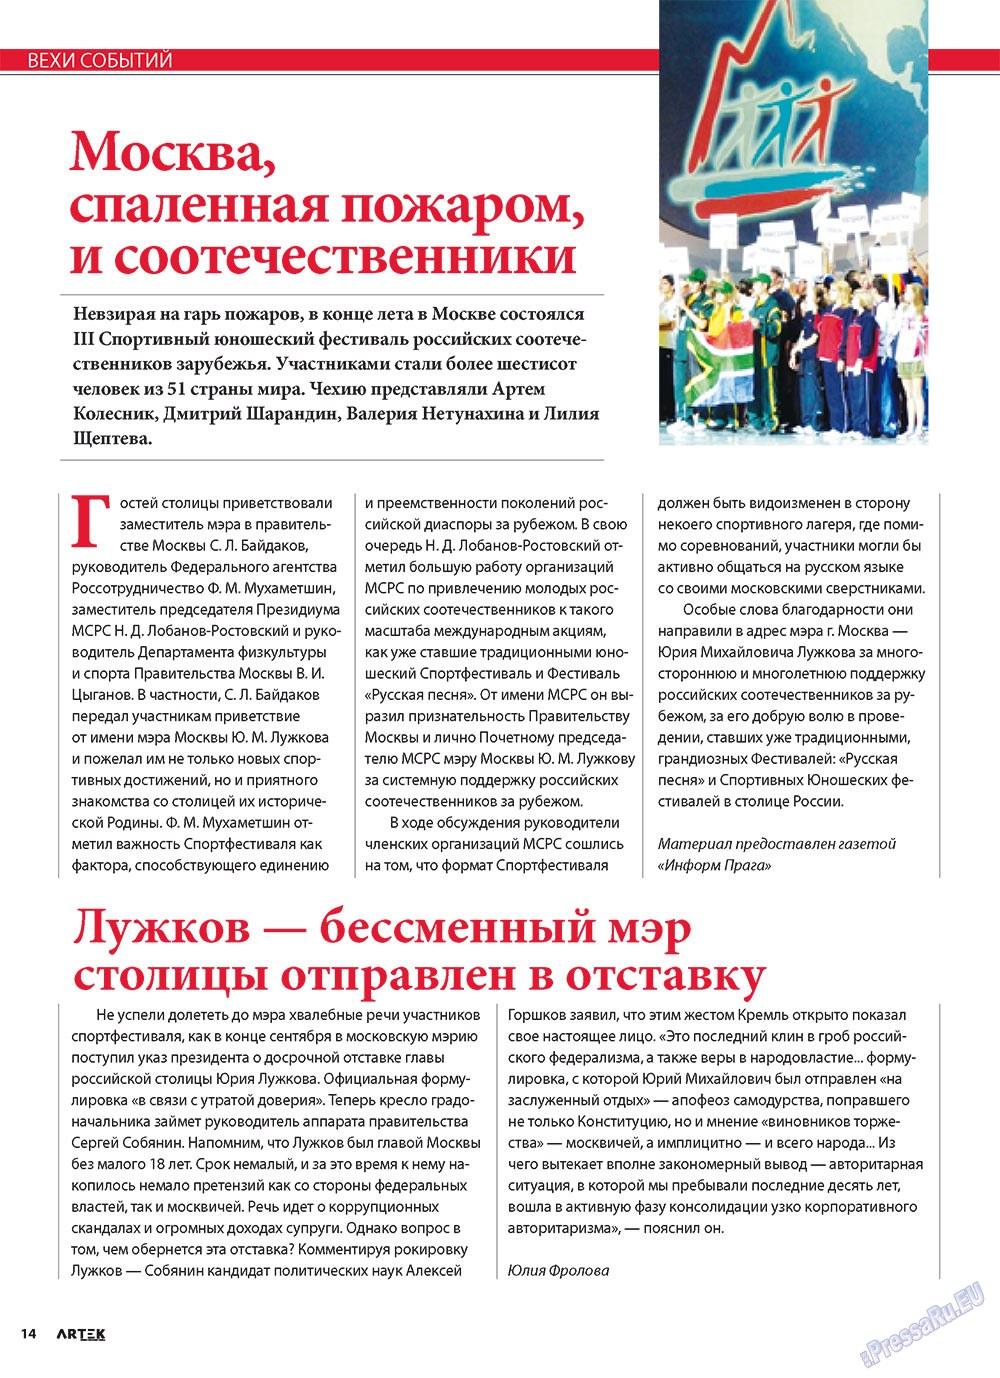 Артек (журнал). 2010 год, номер 5, стр. 16